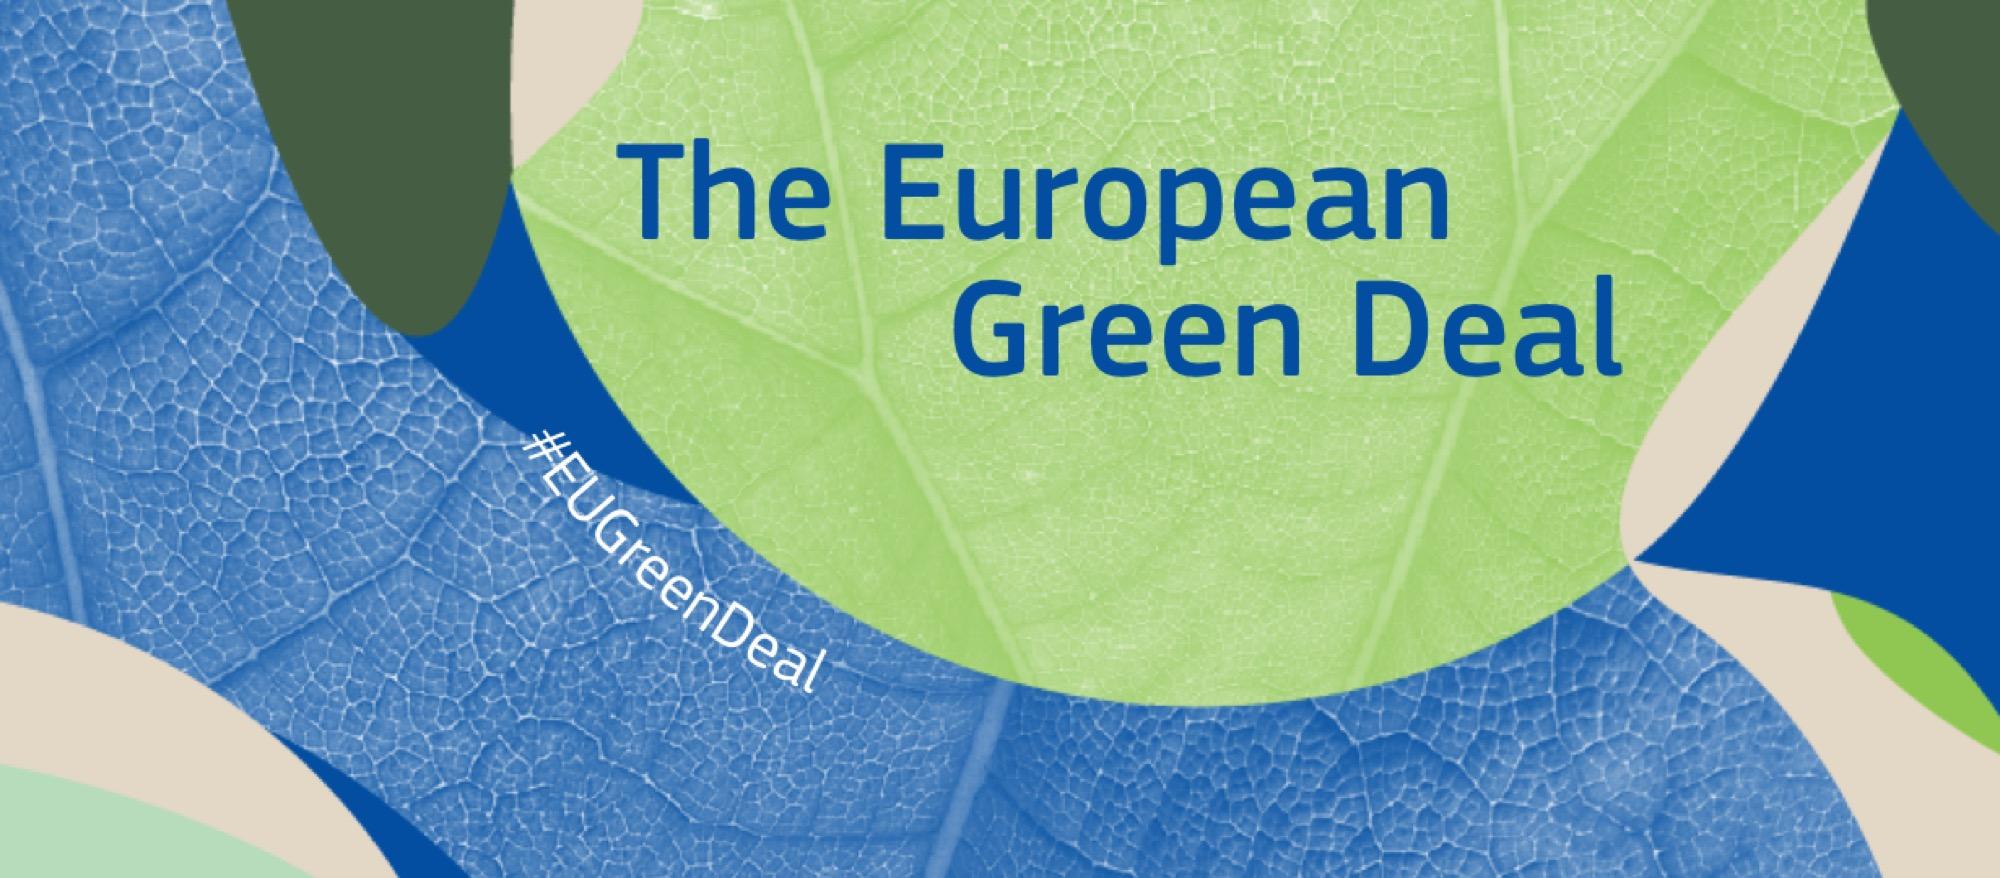 The EU Green Deal